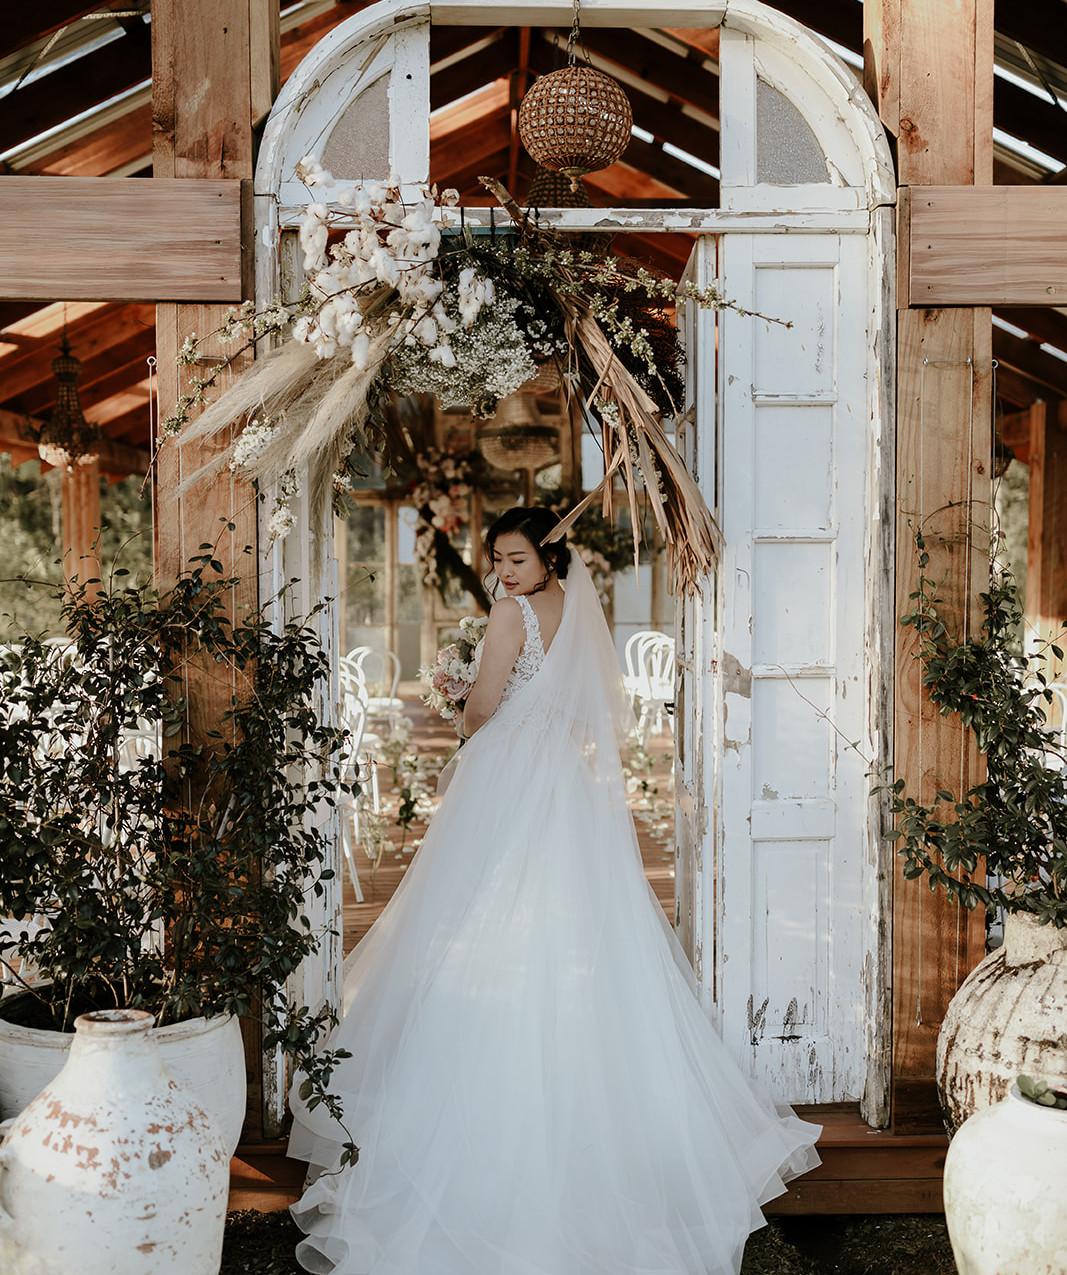 Sydney Wedding Planner  Photography: Zoe Morley Photography